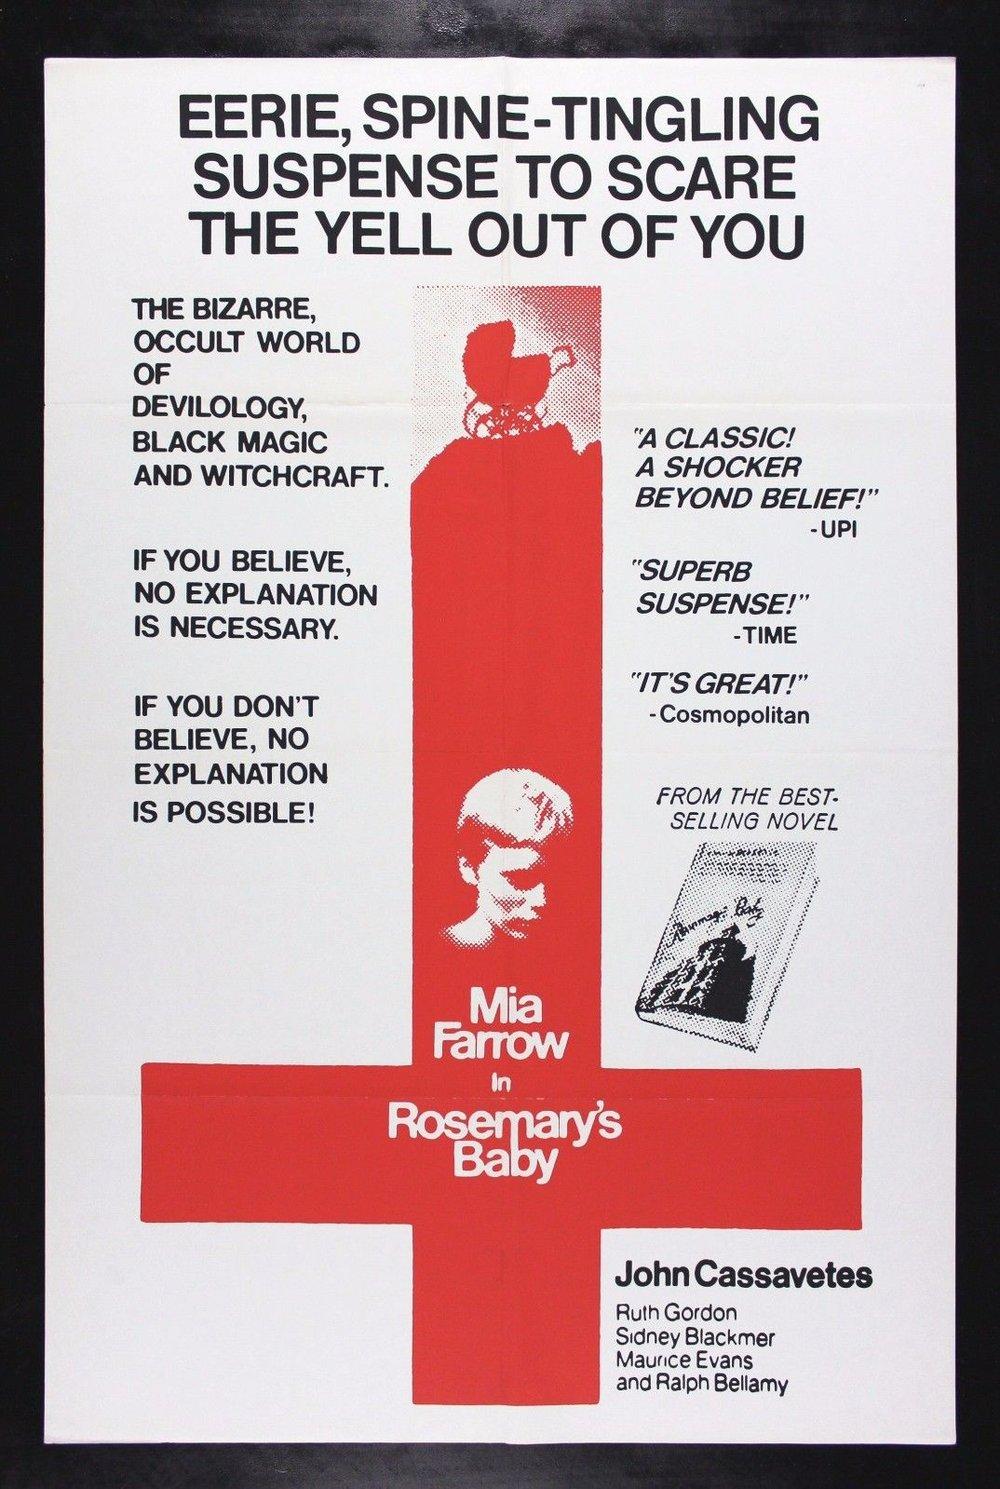 Rosemary's-Baby-Rare-American-Poster.jpg